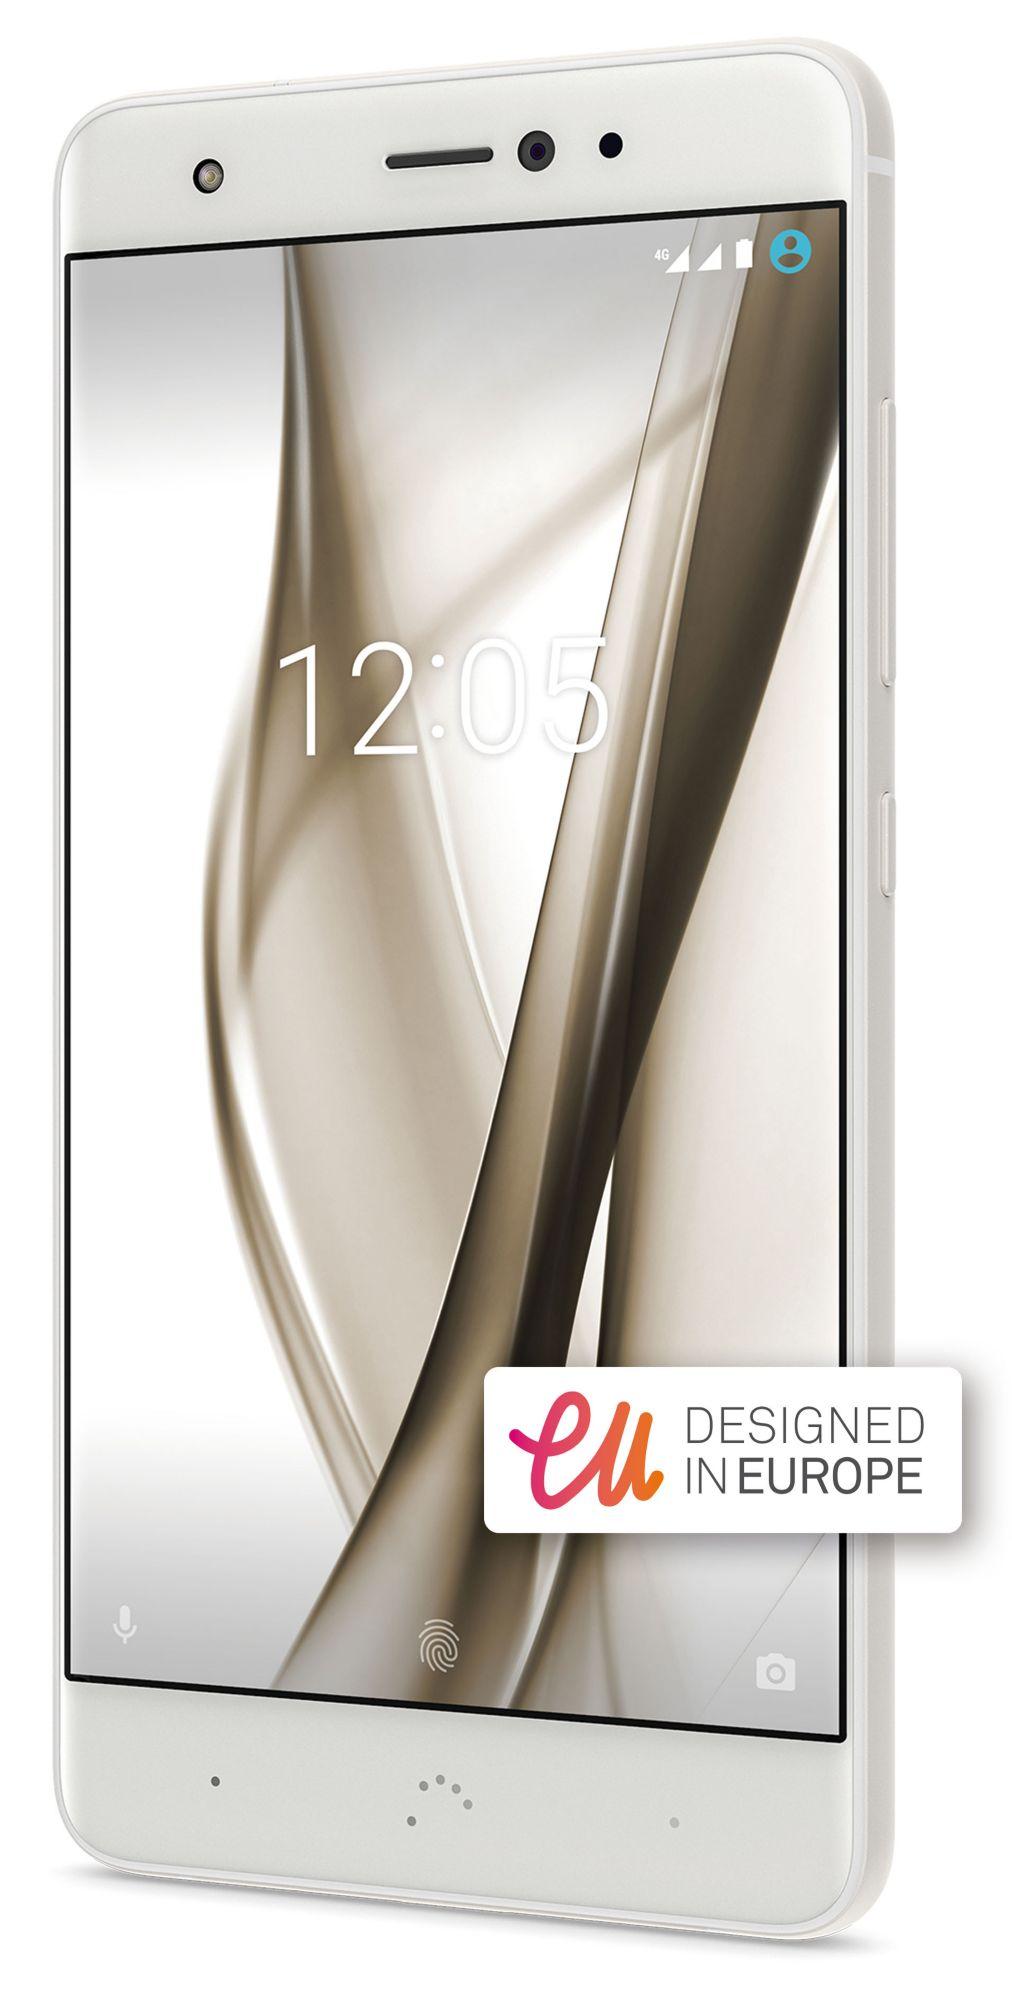 BQ bq Smartphone mit Dual Nano SIM & Android 7.1.1 Nougat »Aquaris X Pro 64+4«